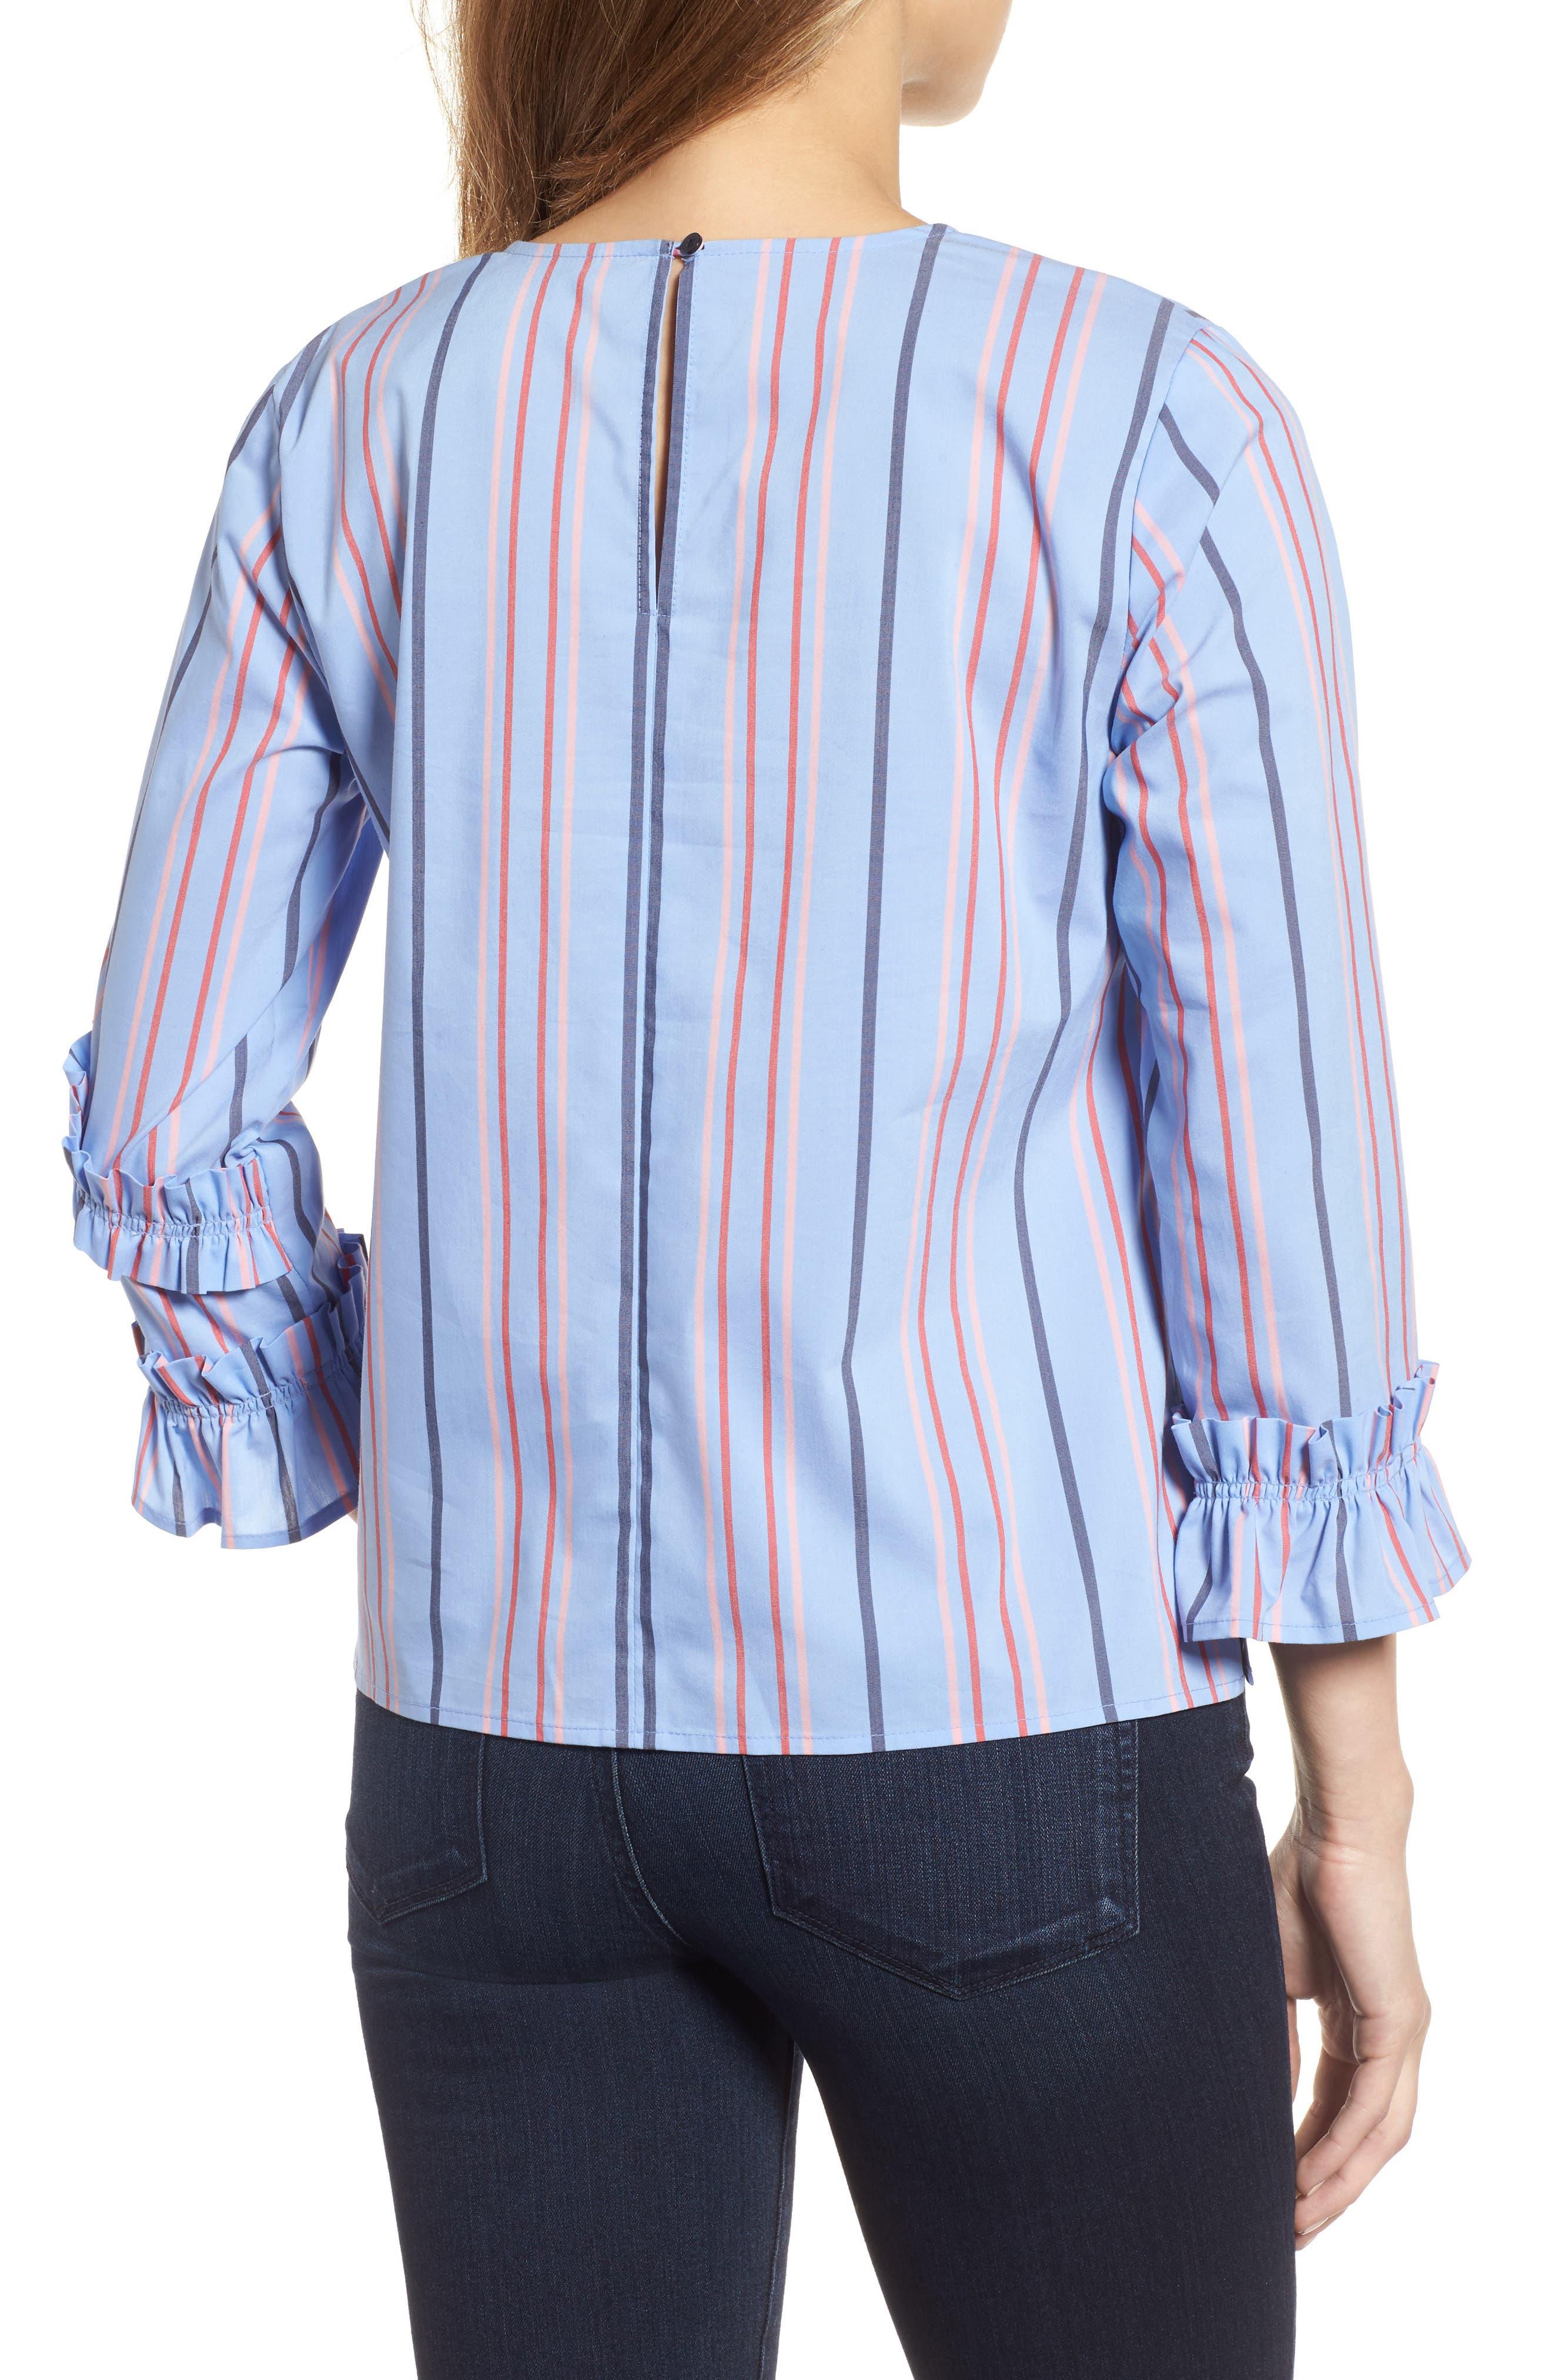 Ruffle Detail Poplin Shirt,                             Alternate thumbnail 2, color,                             Blue Multi Stripe